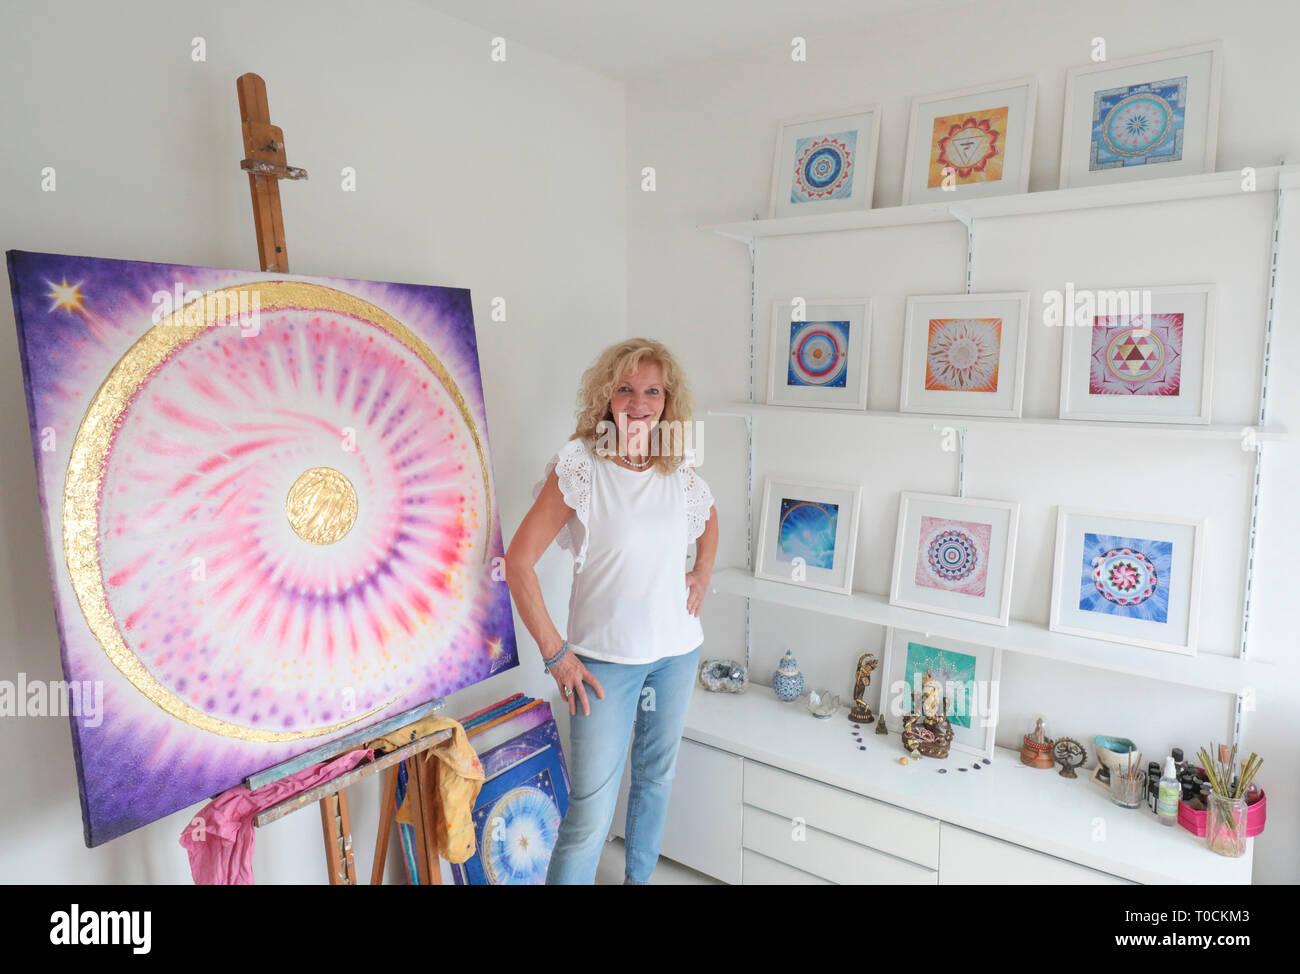 MARLIS LADUREE/ARTISTE PEINTRE DE MANDALAS - Stock Image